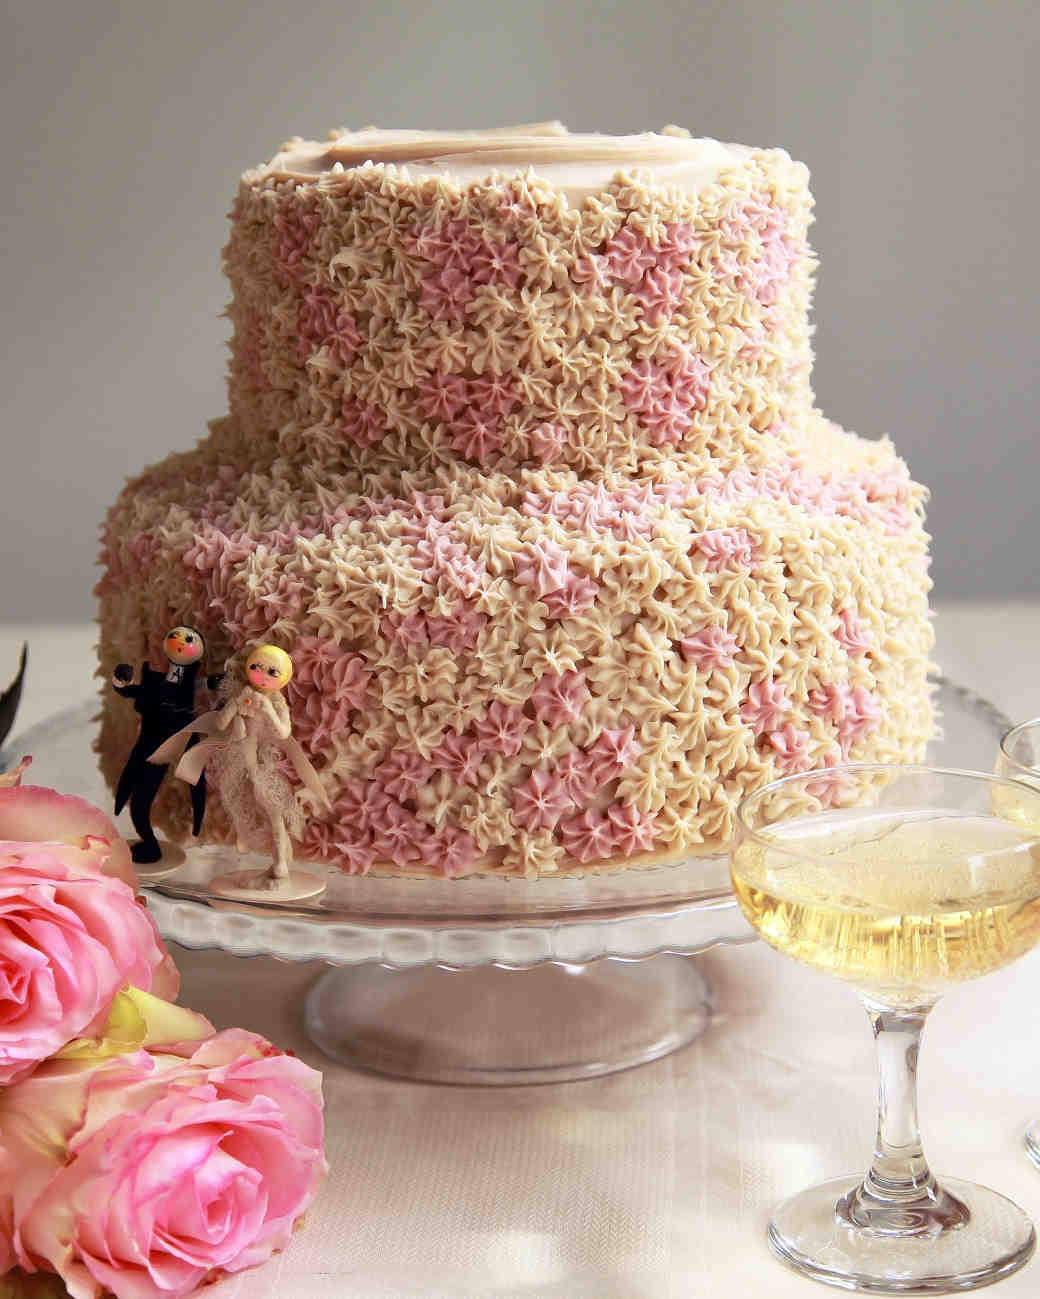 Gluten-Free Vegan Wedding Cake | Rhians Recipes